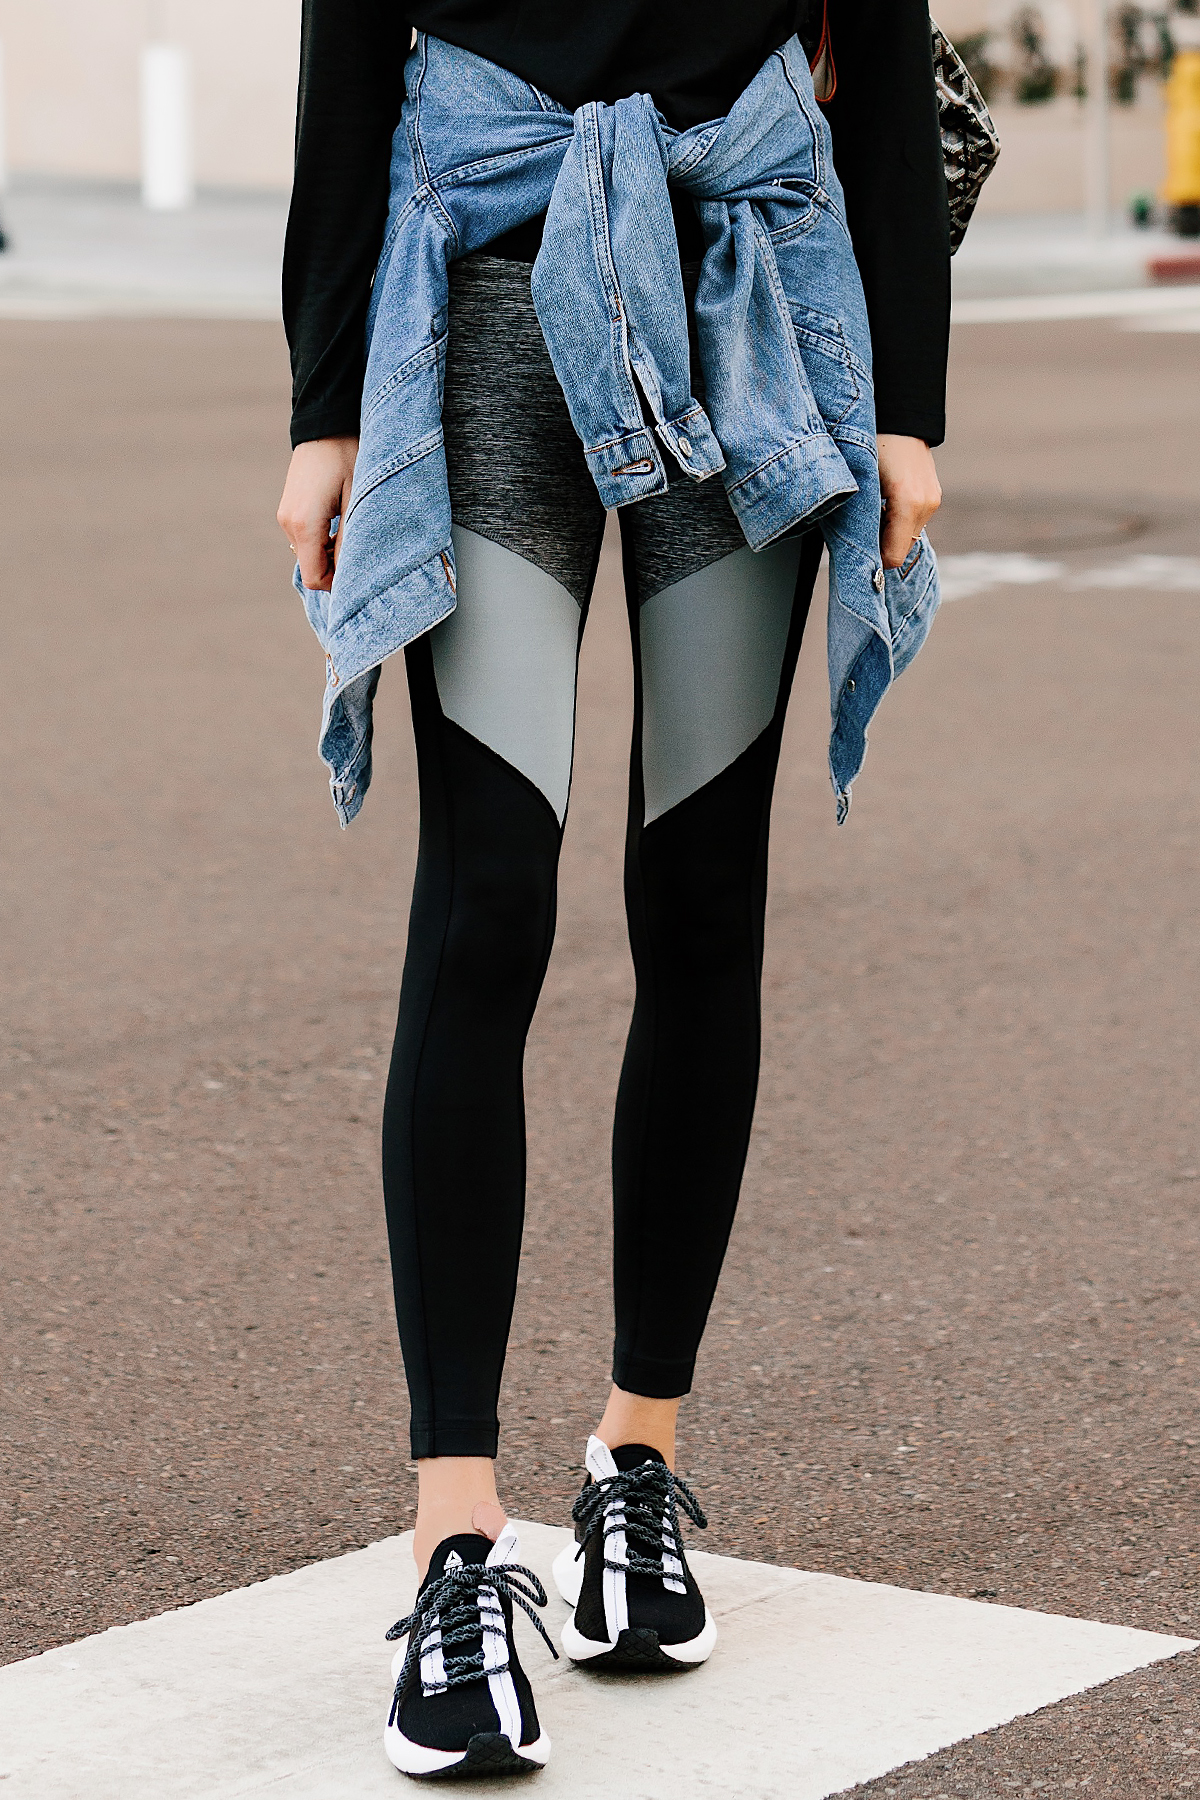 Woman Wearing Denim Jacket Reebok Colorblock Black Leggings Reebok Sole Fury Sneakers Fashion Jackson San Diego Fashion Blogger Street Style Athleisure Outfit